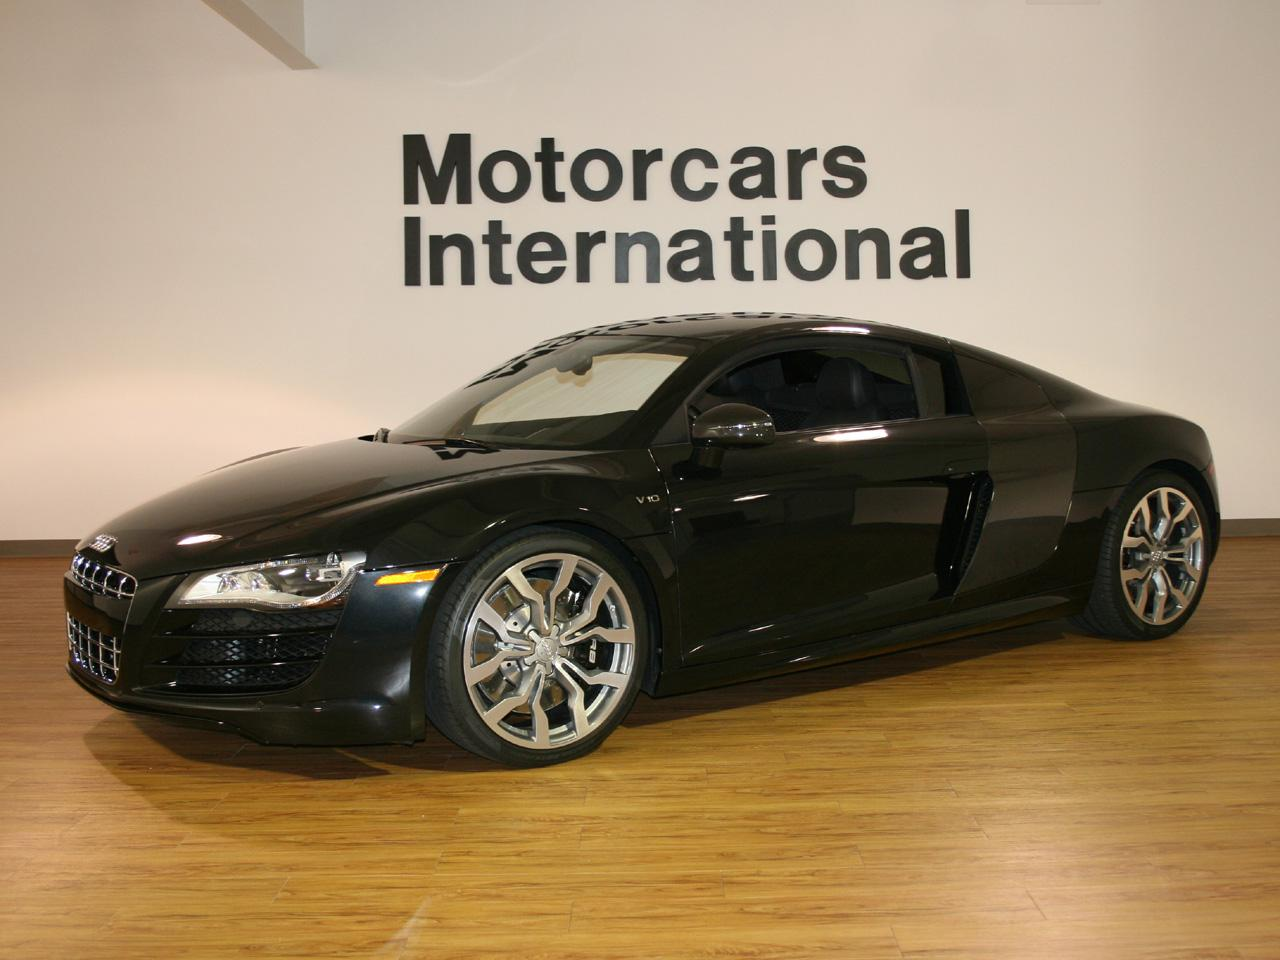 2011 Audi R8 V10 Coupe